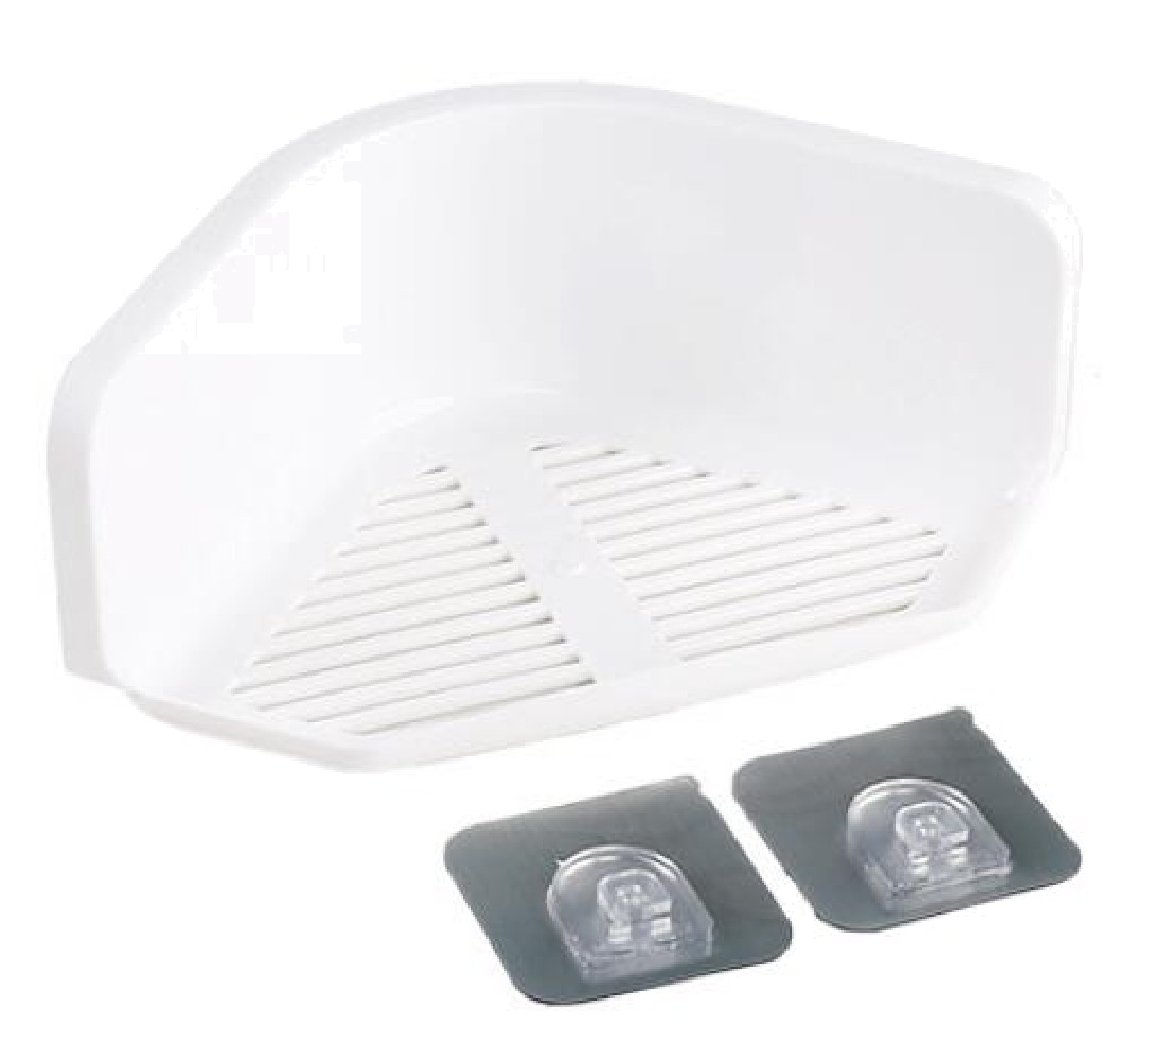 Ruhua Shelving Solid Storage Bathroom Iron Absorption Bookcase White US 2 shelves